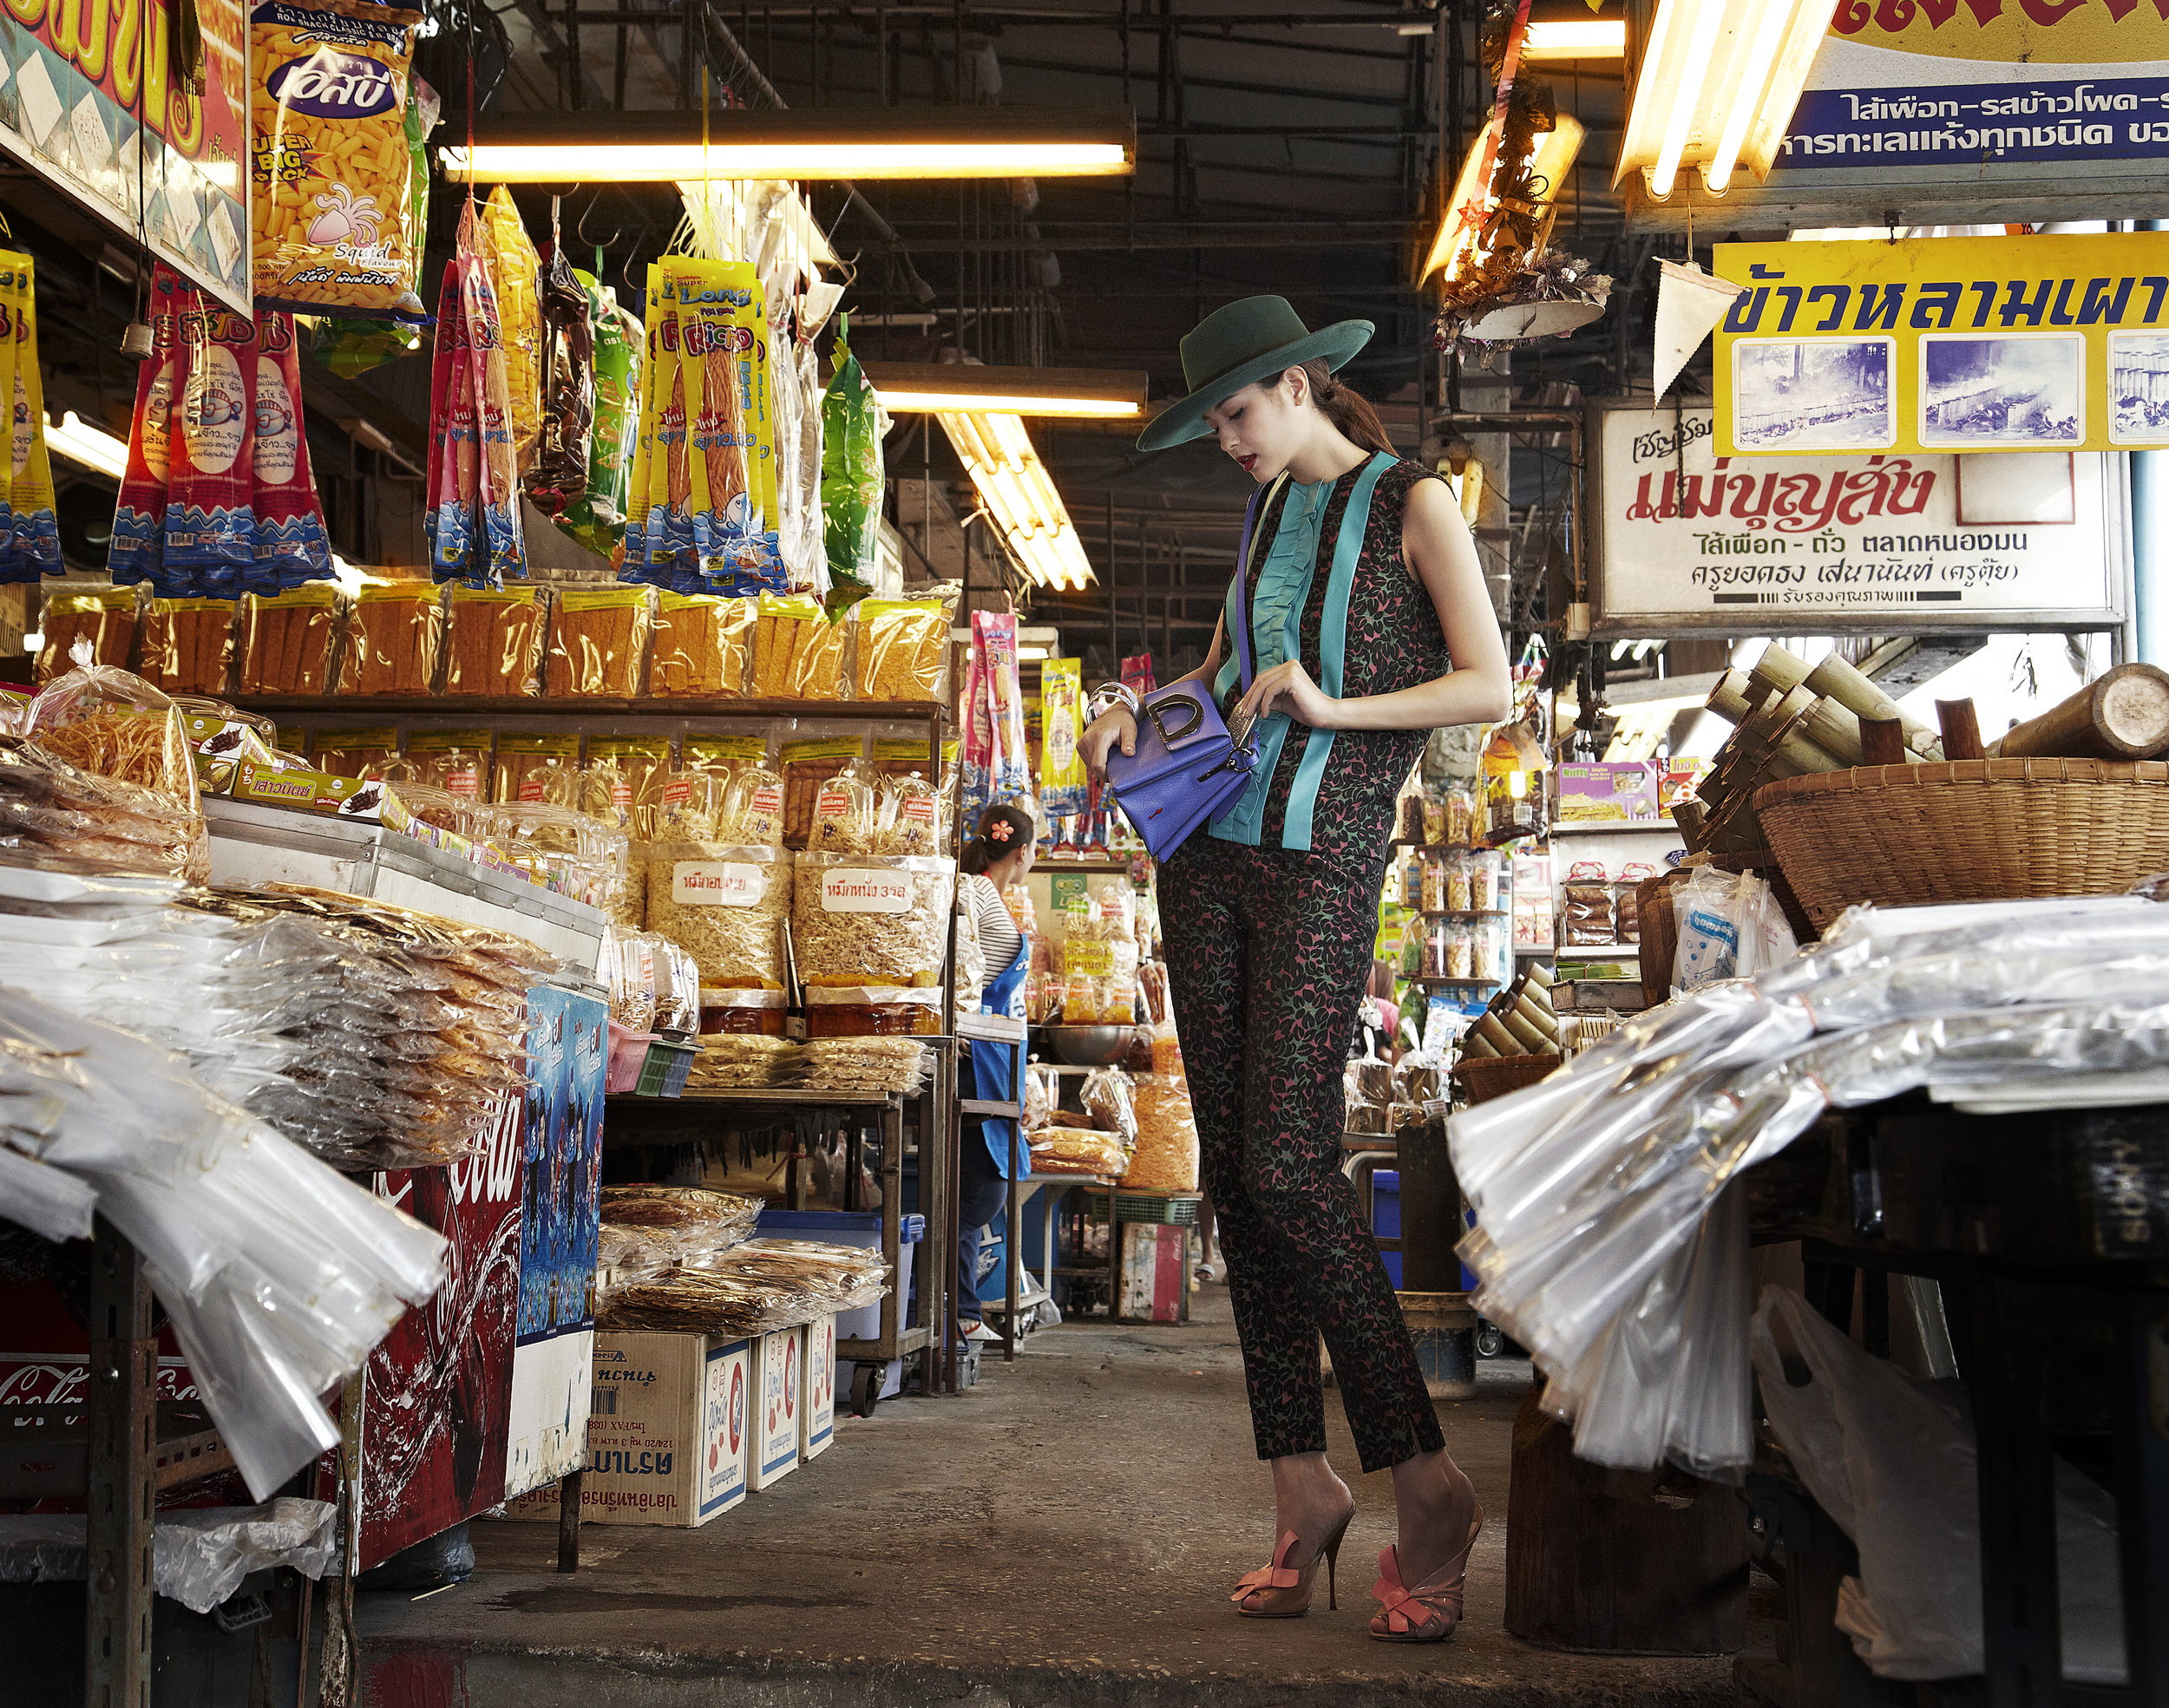 Actress : Marie Broenner @marie_broenner  Clothes and Shoes : Miu Miu / Bag : Christian Louboutin  Location : ตลาดหนองมน